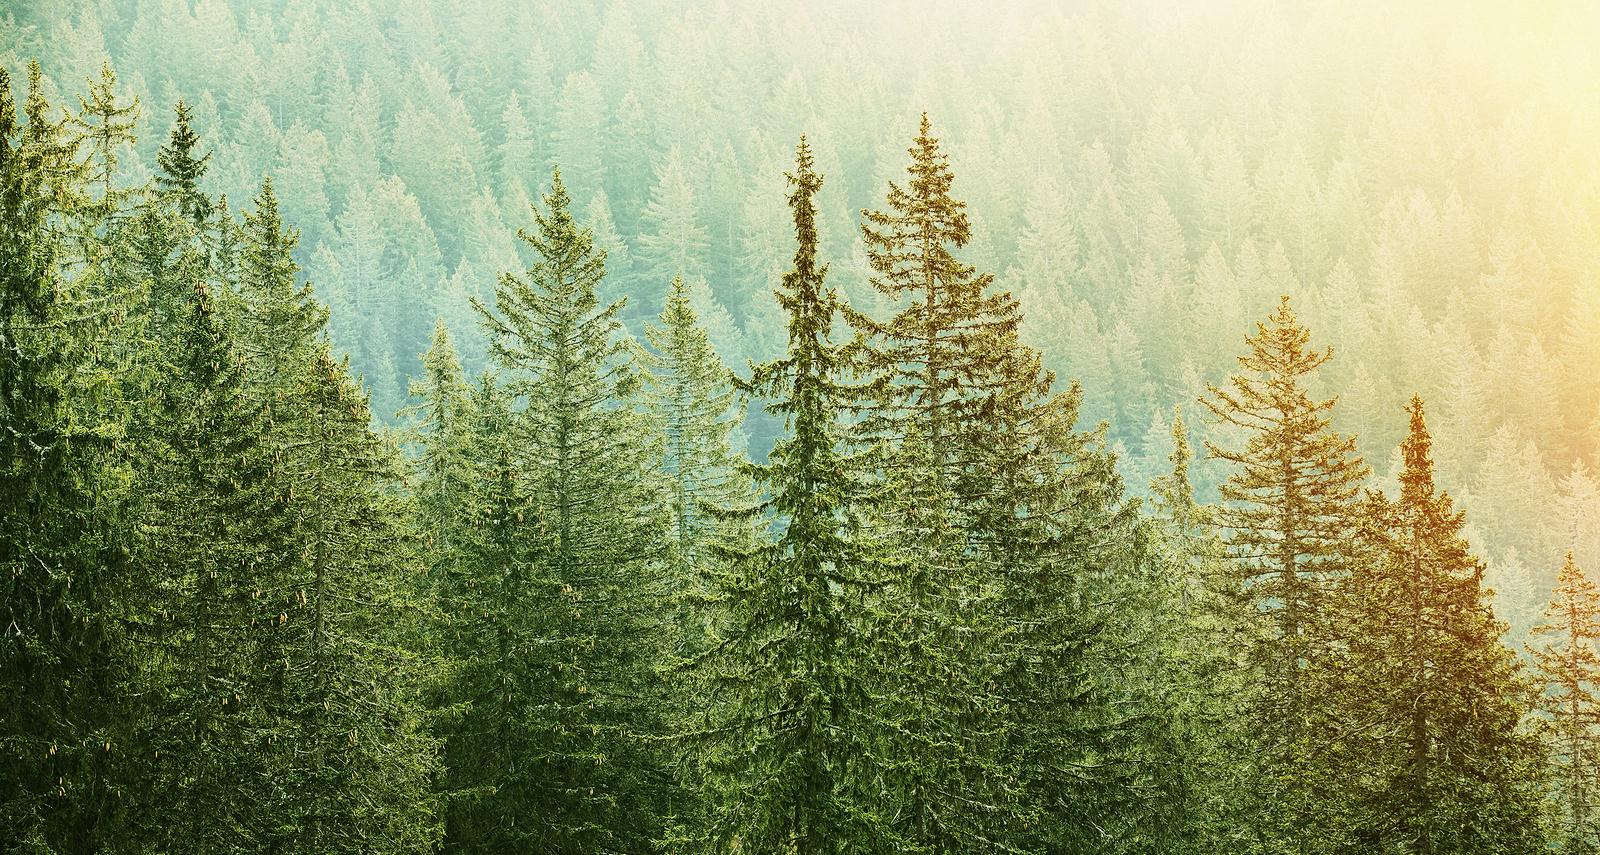 bigstock-Green-Coniferous-Forest-Lit-By-90469688